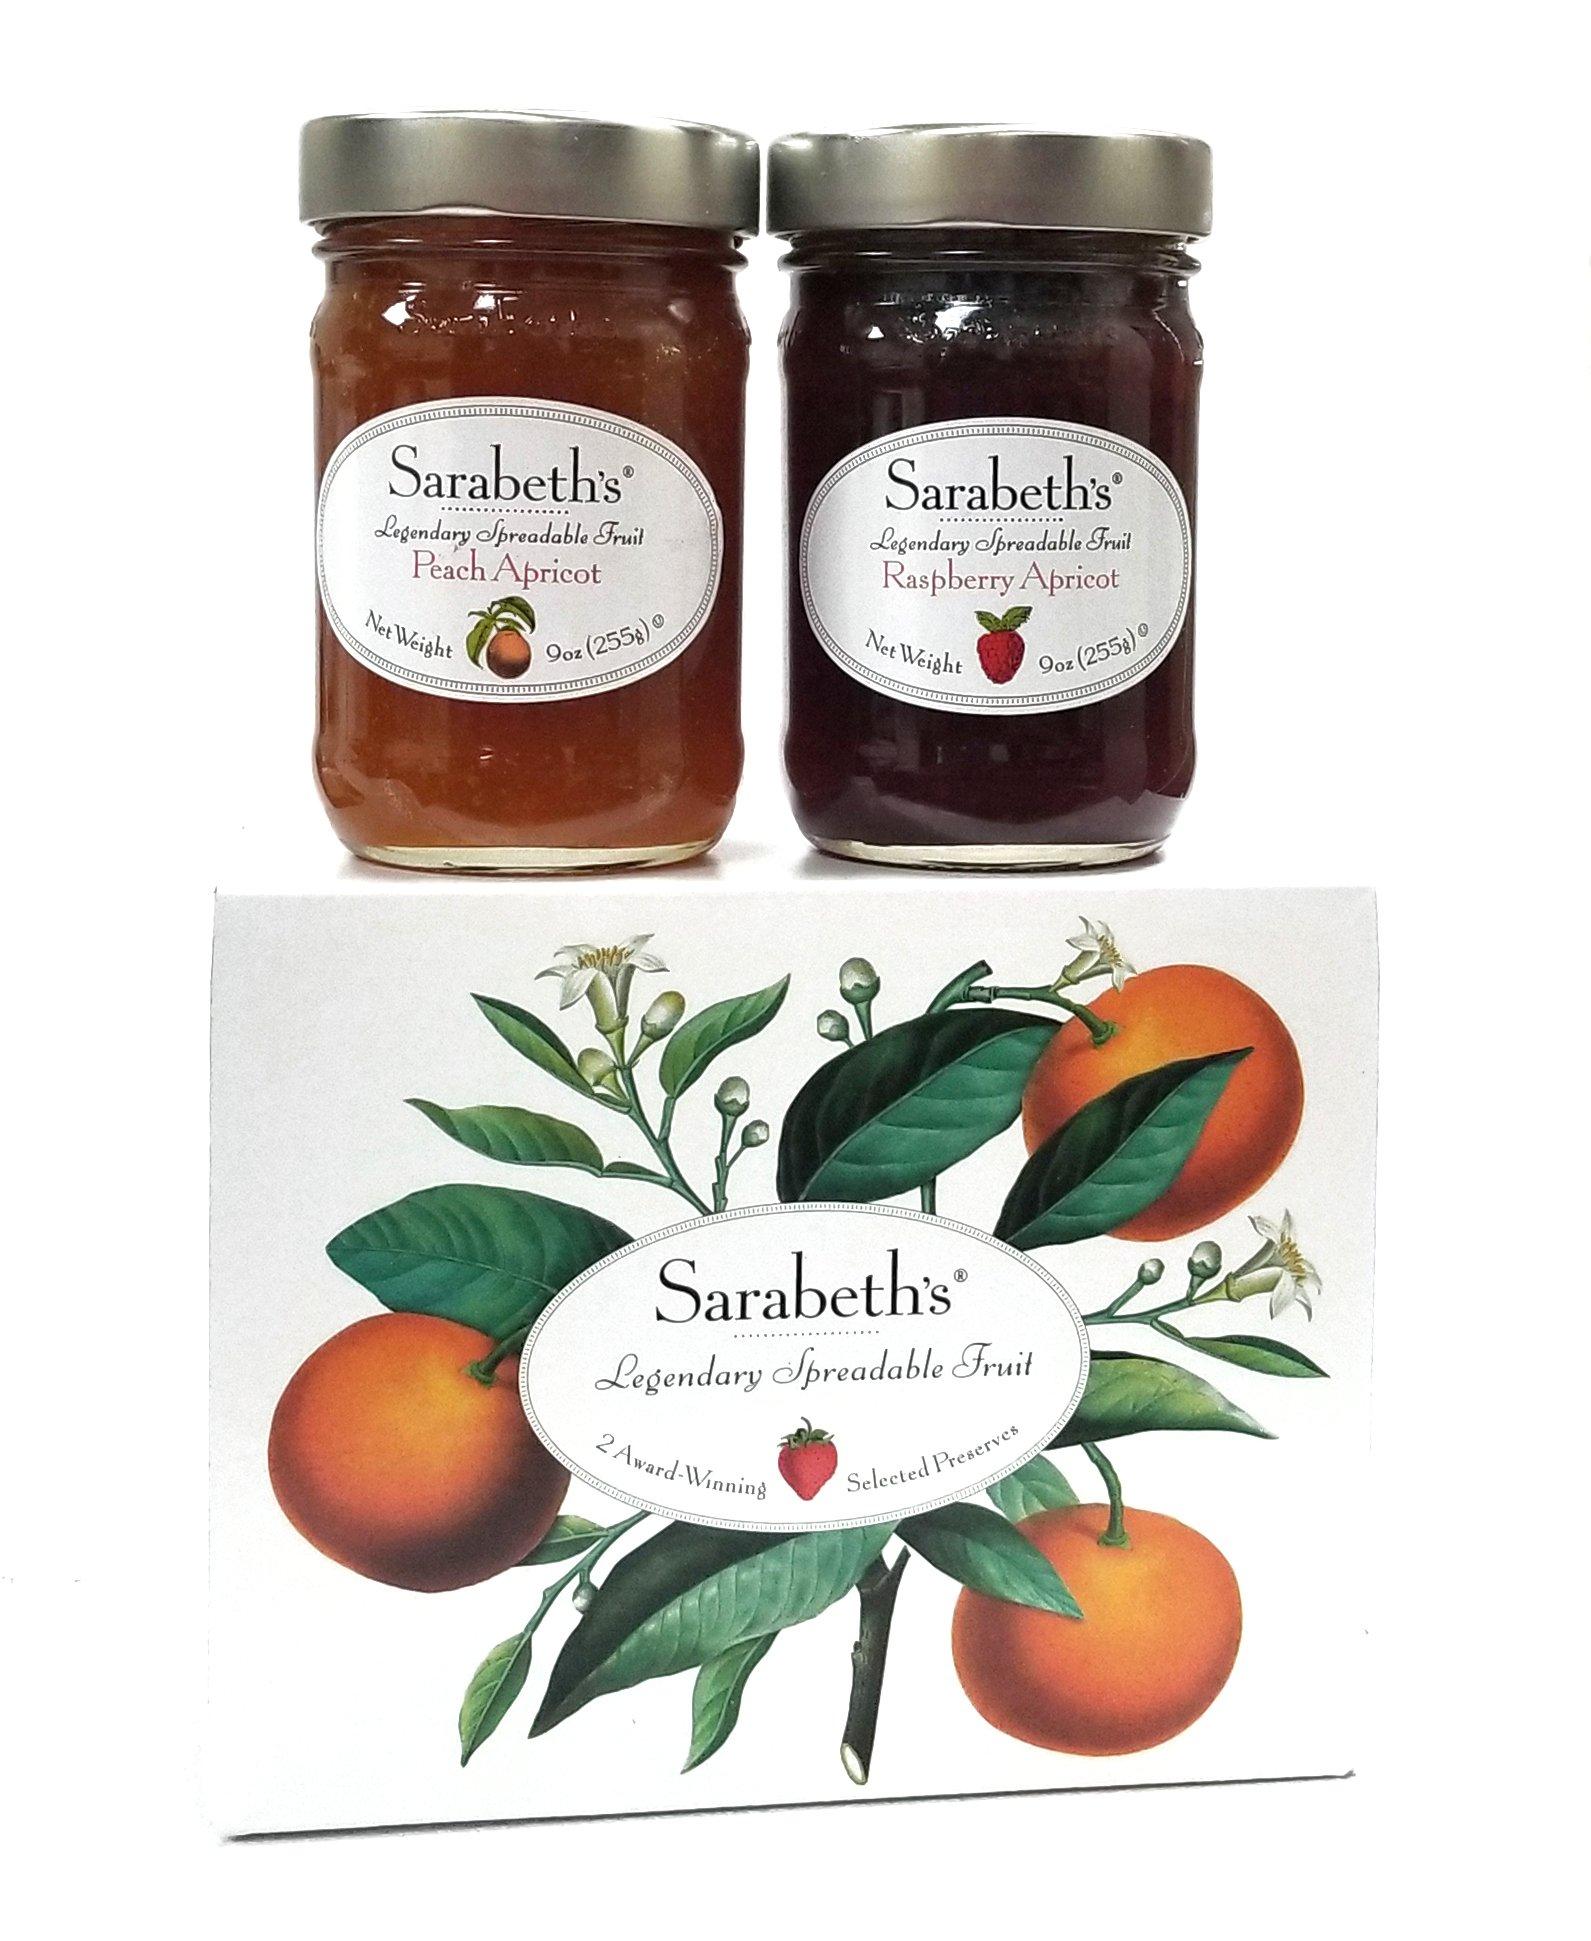 Sarabeth's Two Jar Gift Box Set - Two 9 oz. jars - Peach Apricot & Raspberry Apricot